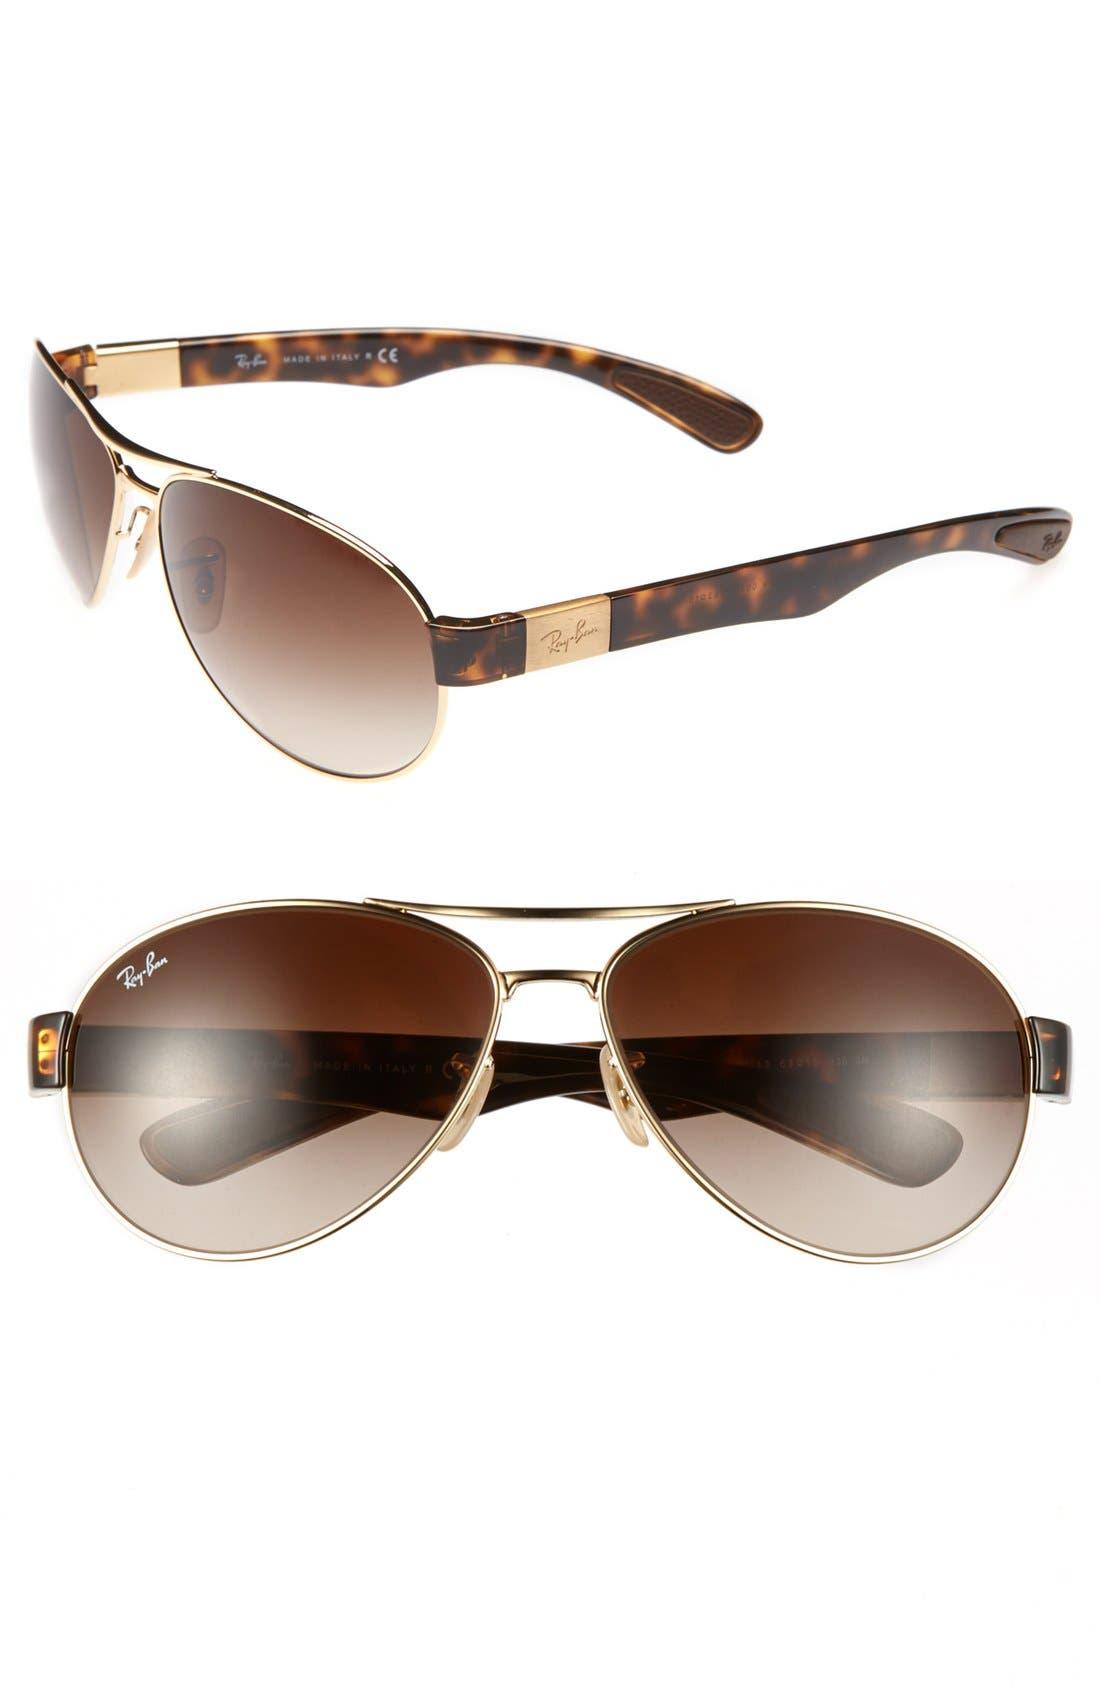 Main Image - Ray-Ban 'Pilot' Sunglasses